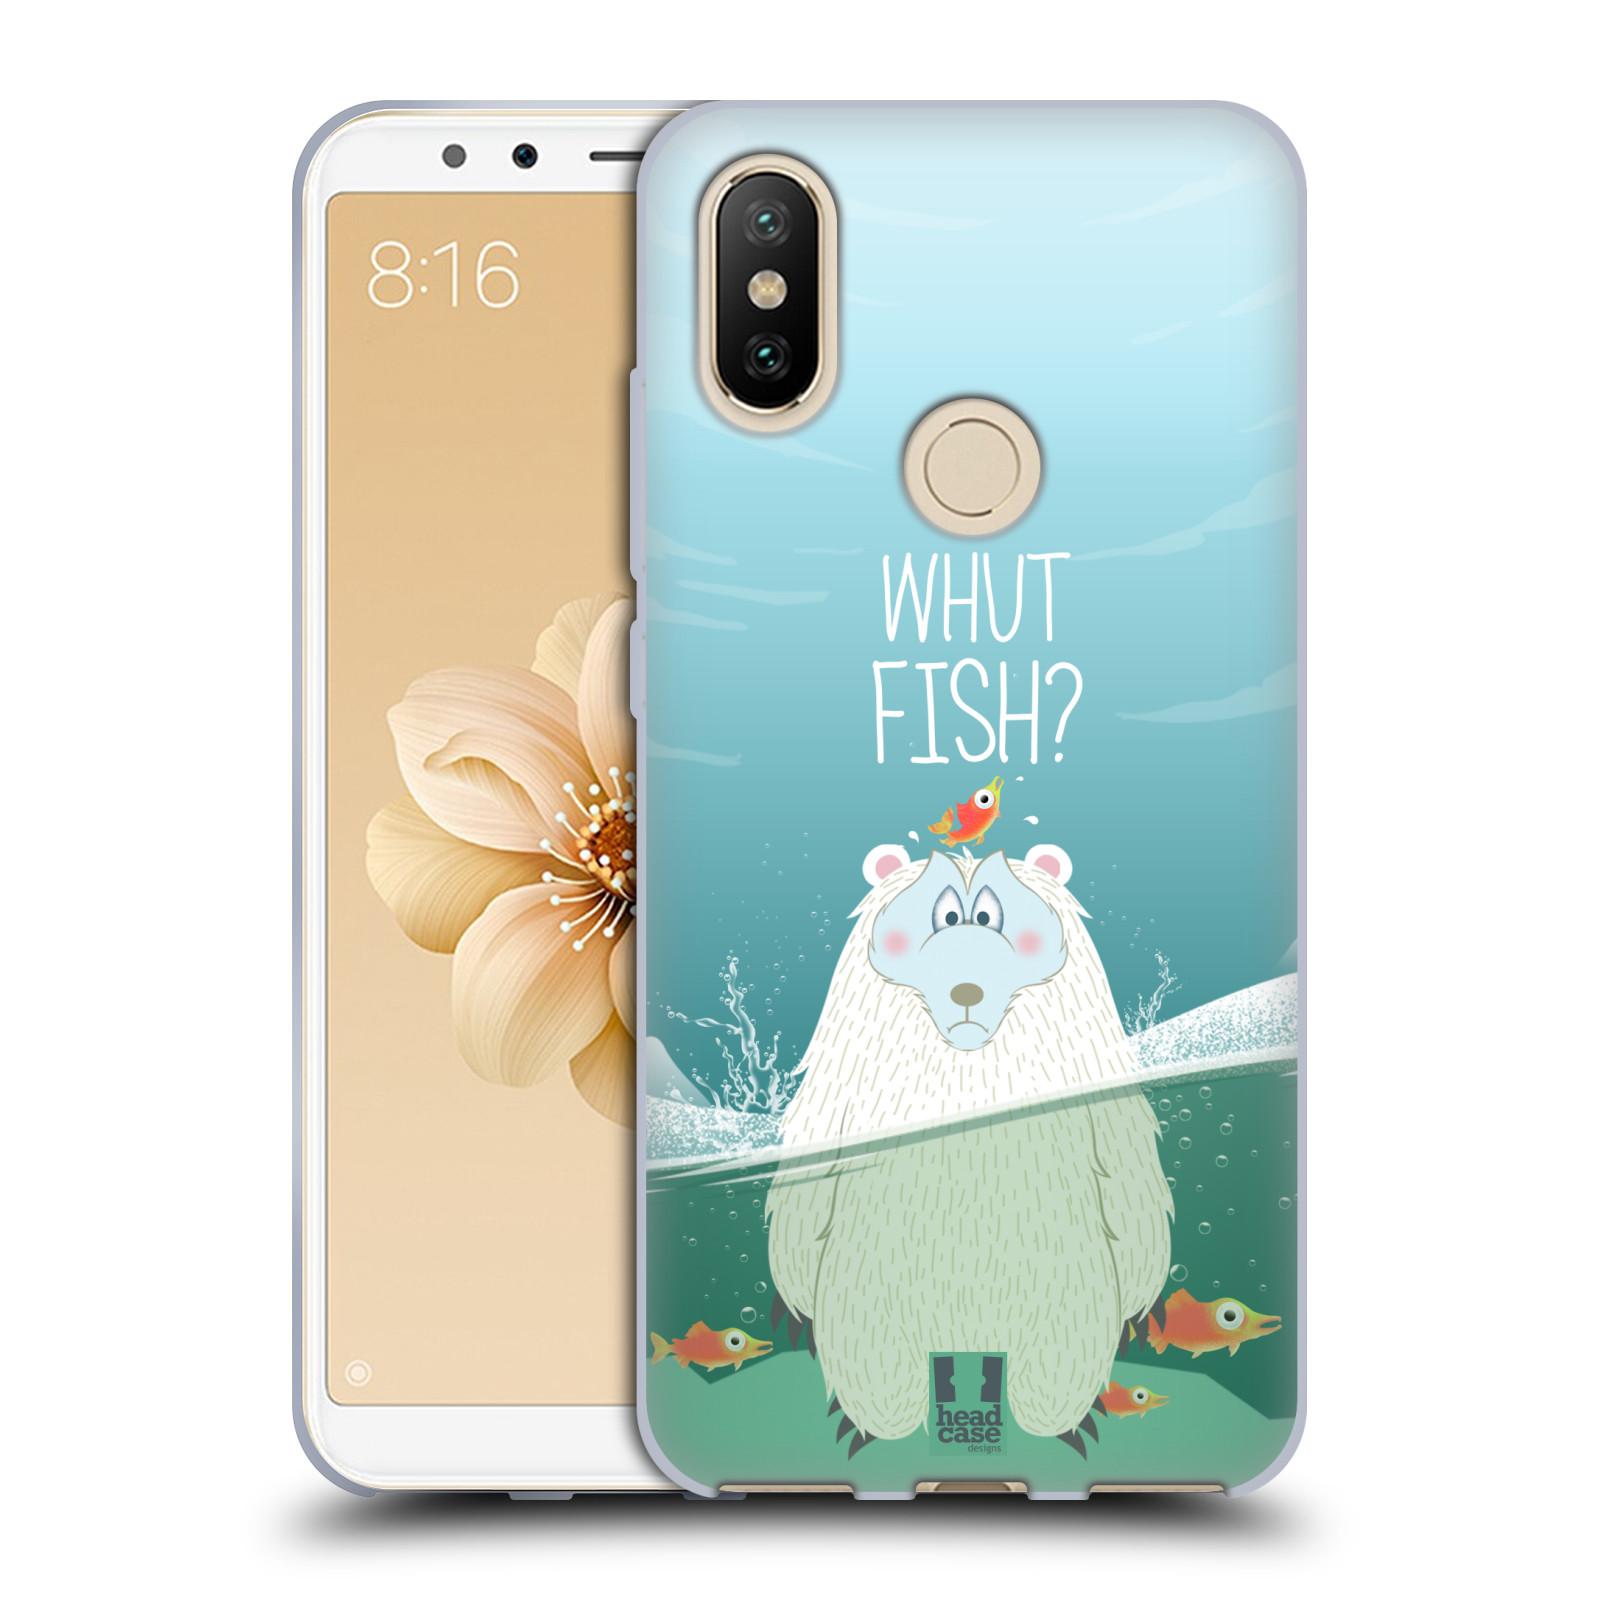 Silikonové pouzdro na mobil Xiaomi Mi A2 - Head Case - Medvěd Whut Fish?